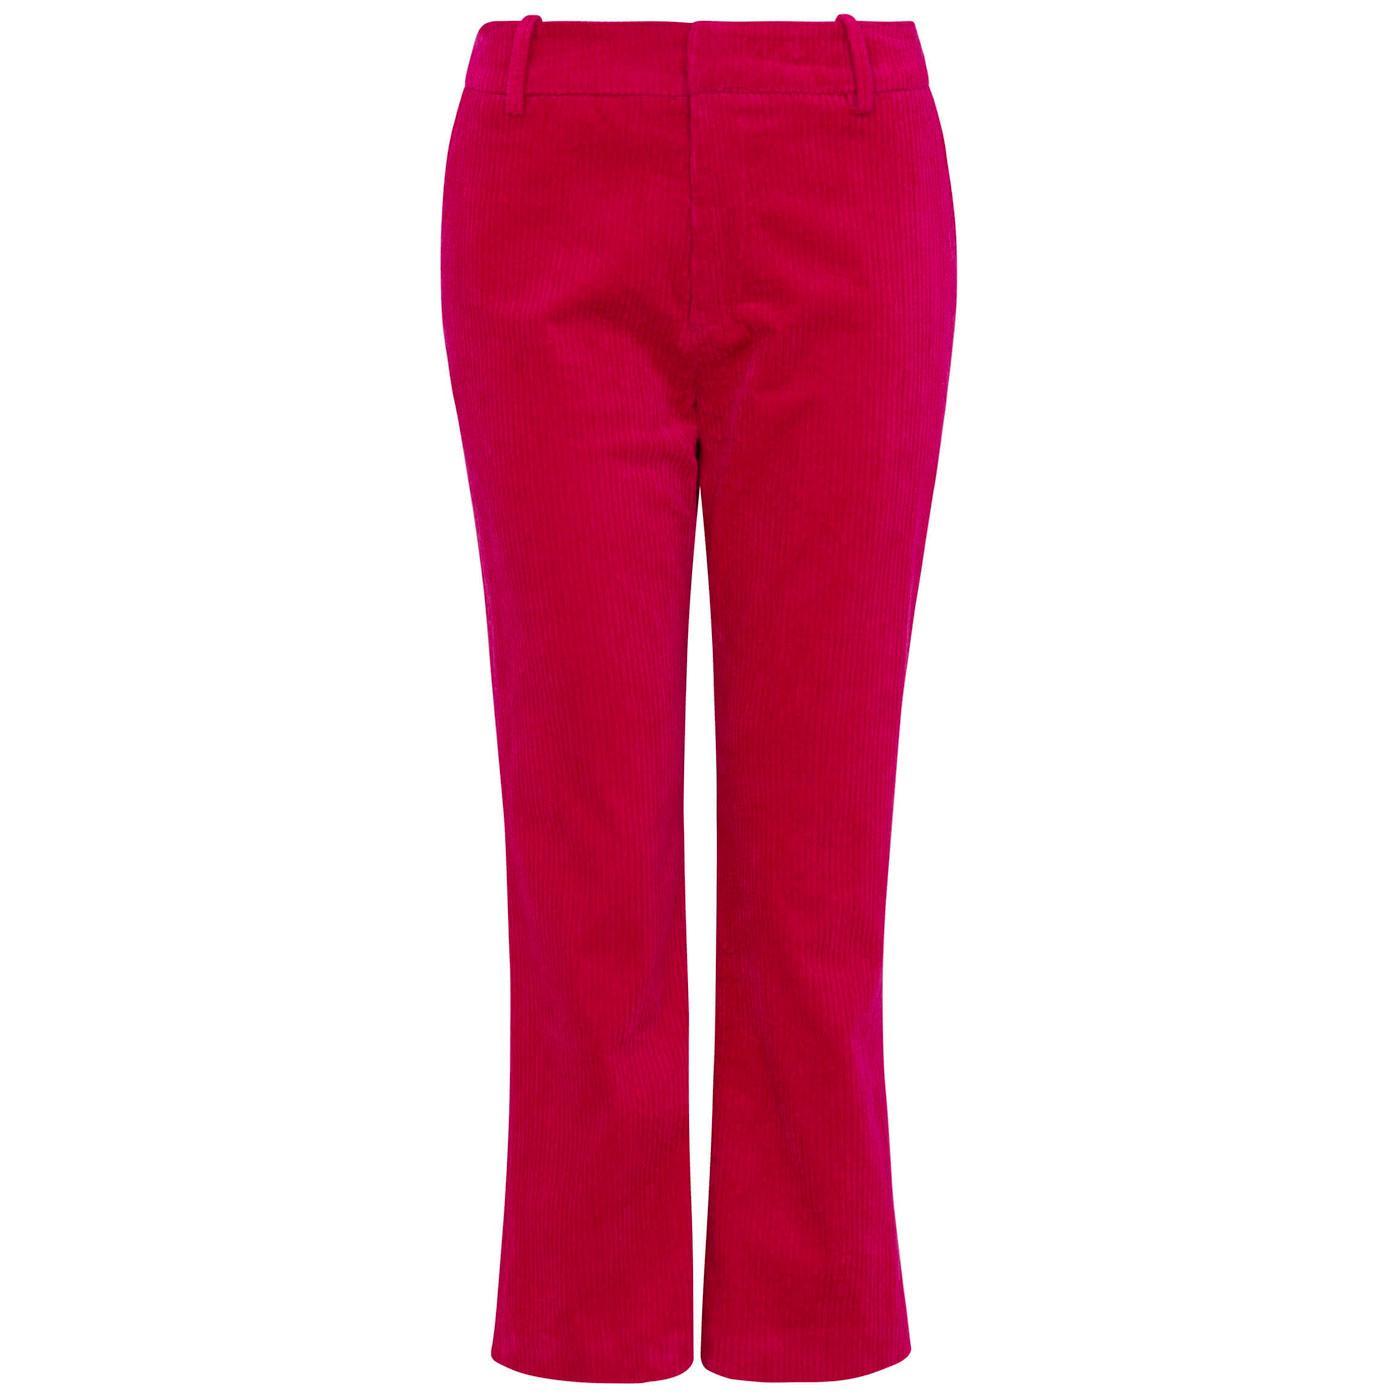 Beth EMILY & FIN Jumbo Cord Trousers Lipstick Pink